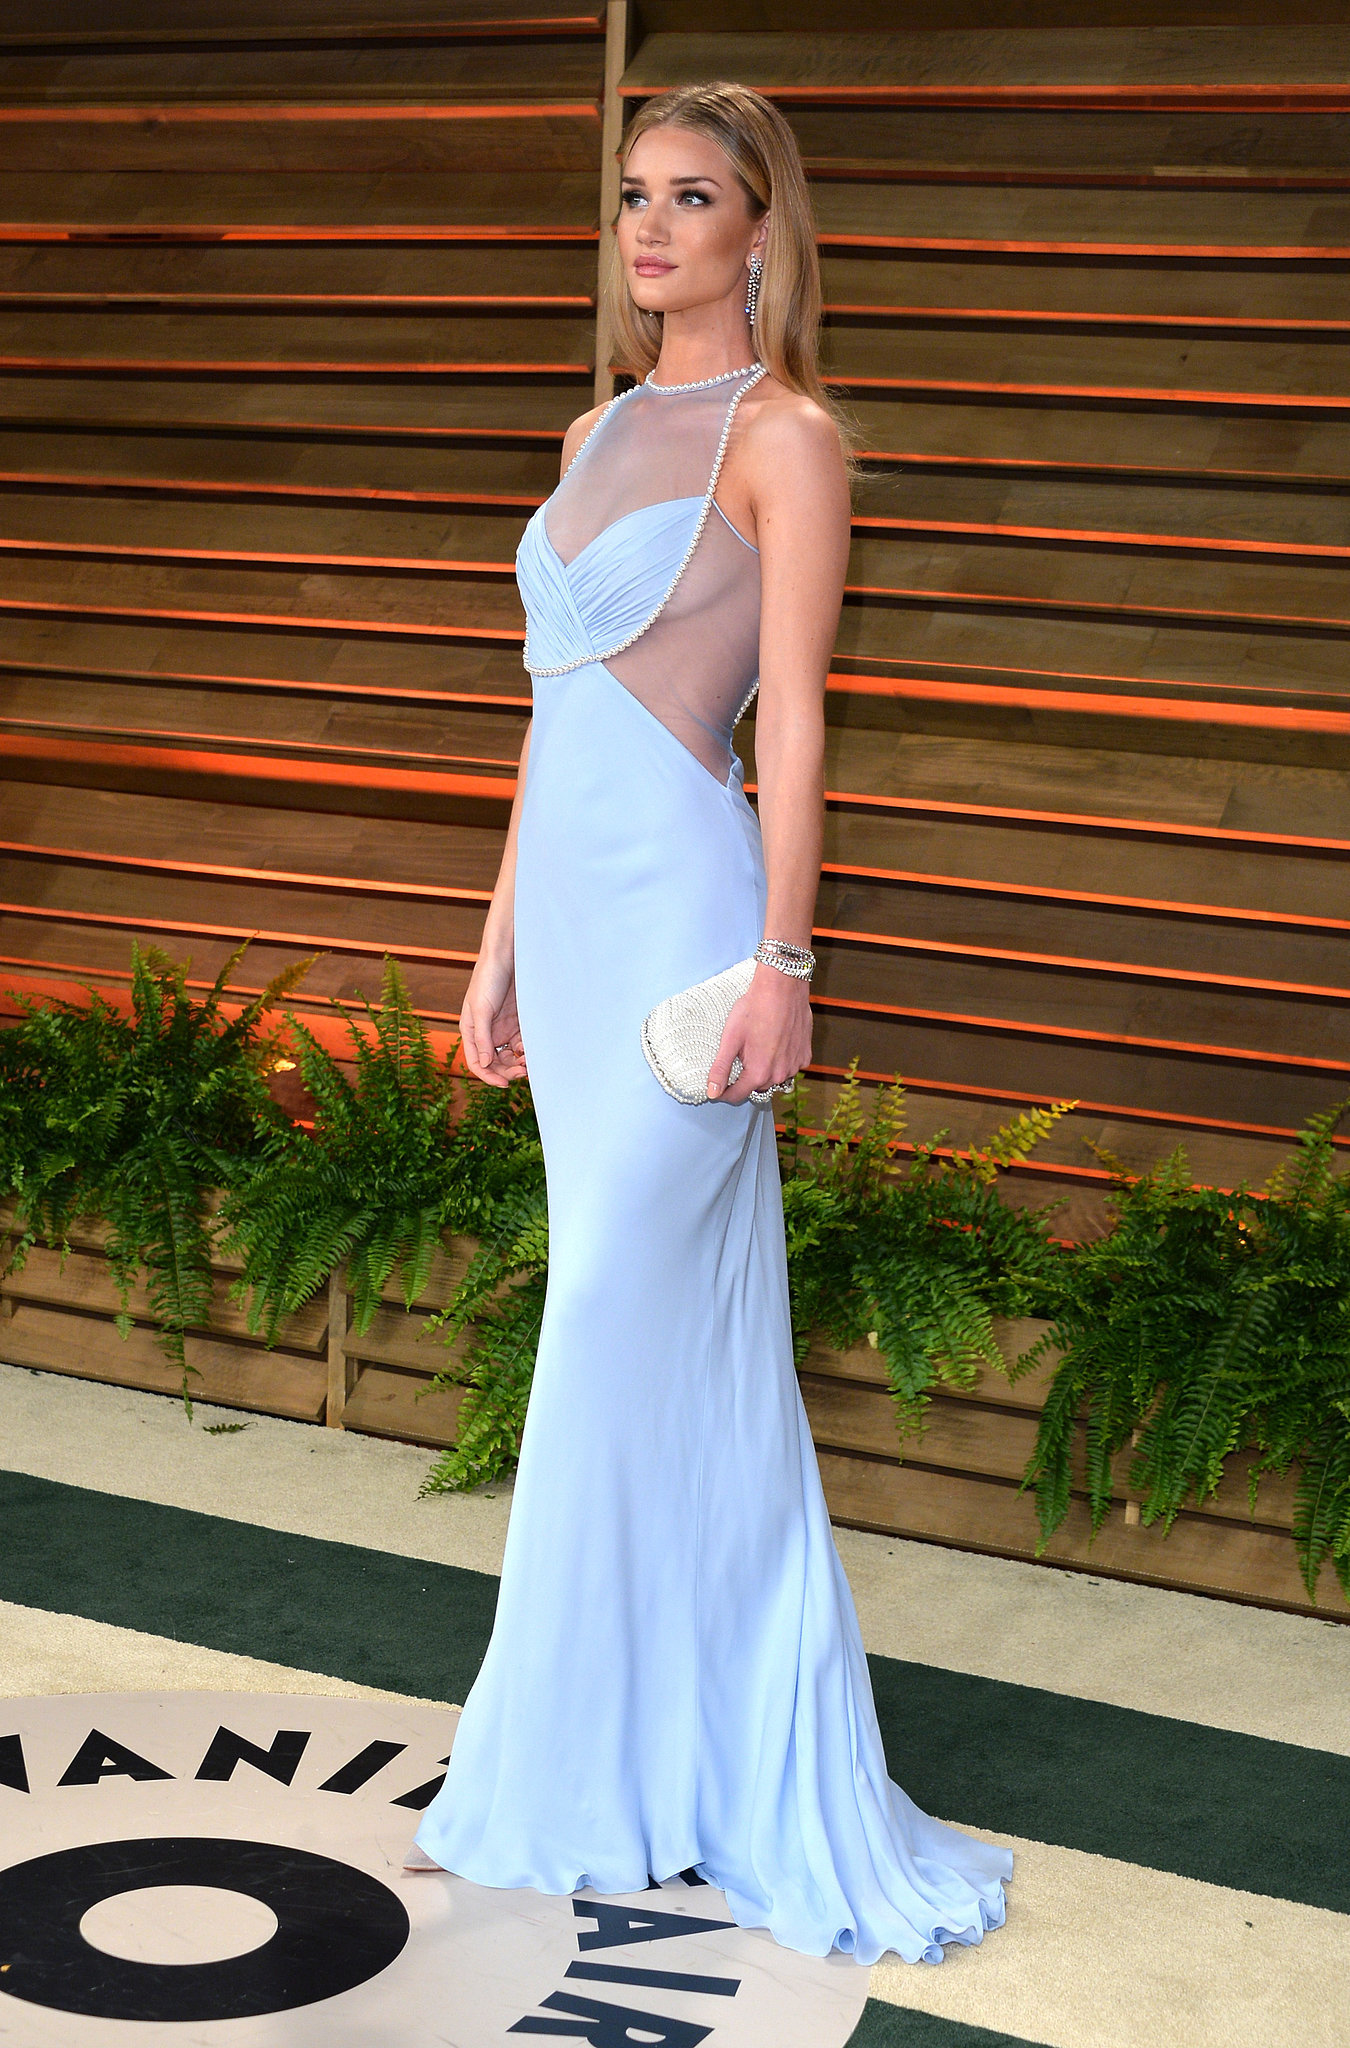 Rosie Huntington-Whiteley at the 2014 Vanity Fair Oscars Party